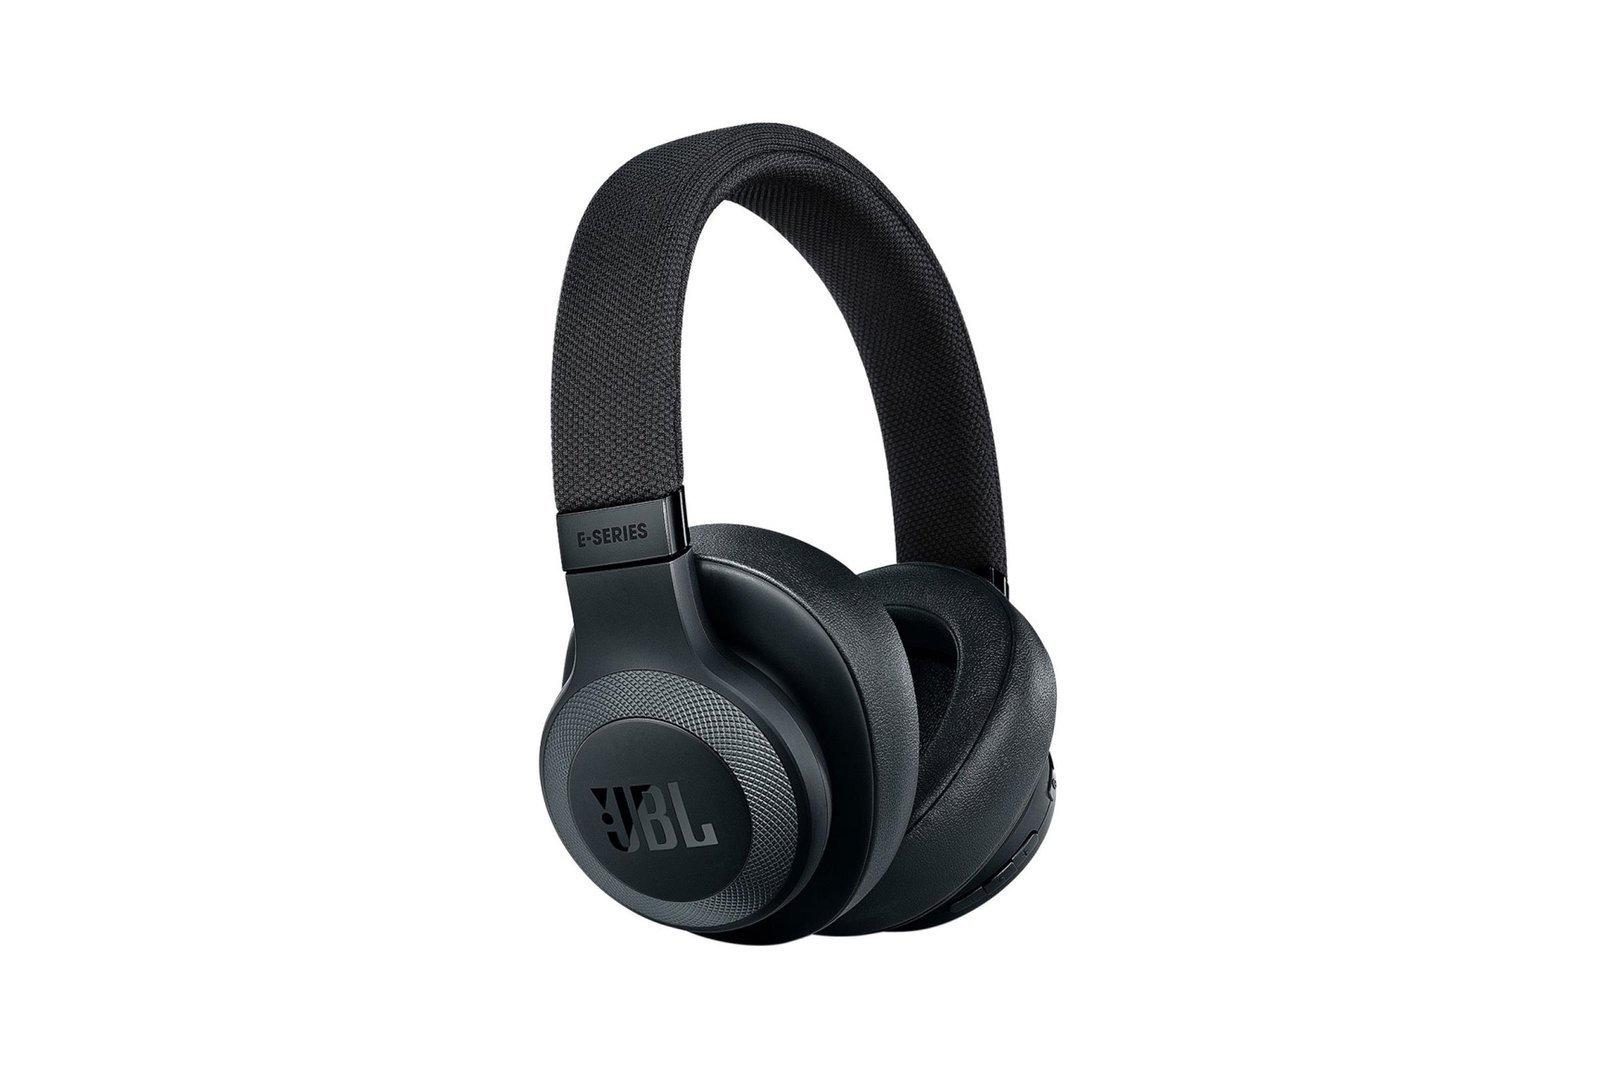 NEU OVP JBL E65BTNC Kopfhörer Drahtloses Bluetooth Over-Ear Black Headset